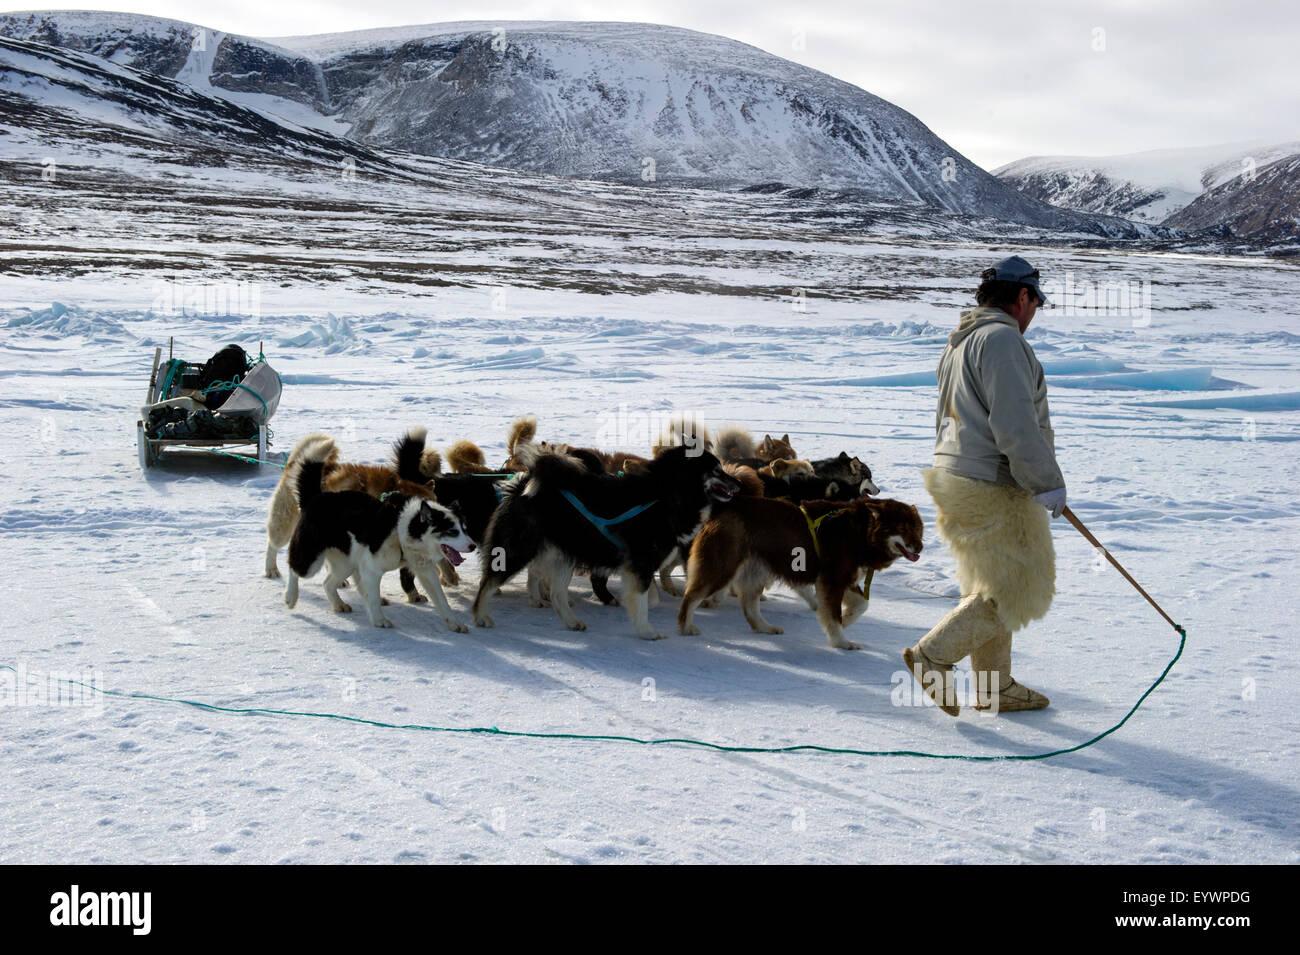 Inuit hunter walking his dog team on the sea ice, Greenland, Denmark, Polar Regions - Stock Image